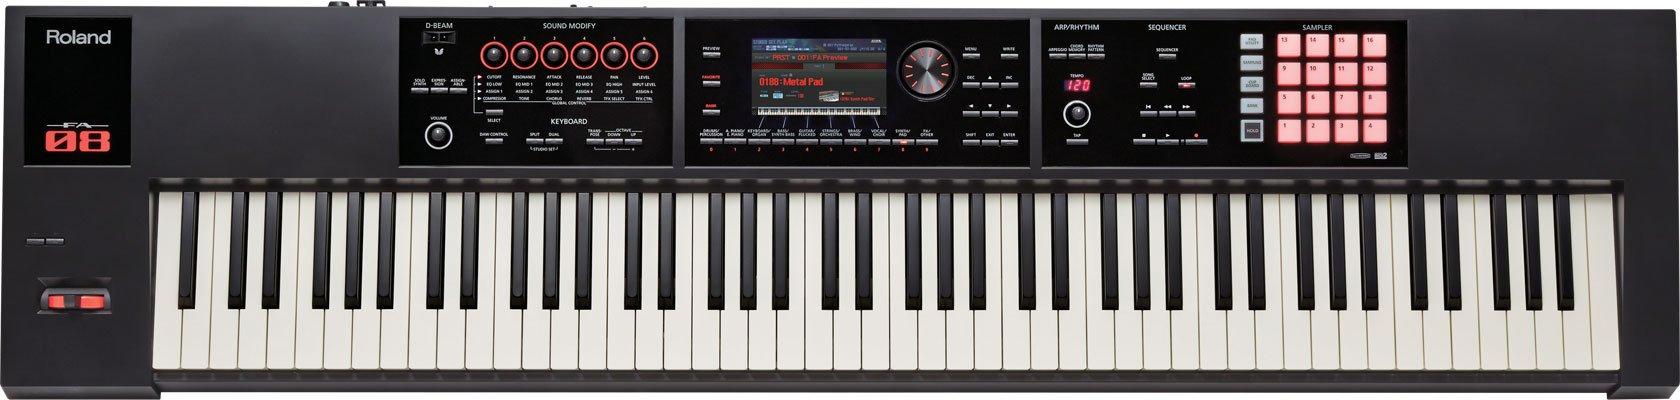 Roland 88-key Music Workstation (FA-08) by Roland